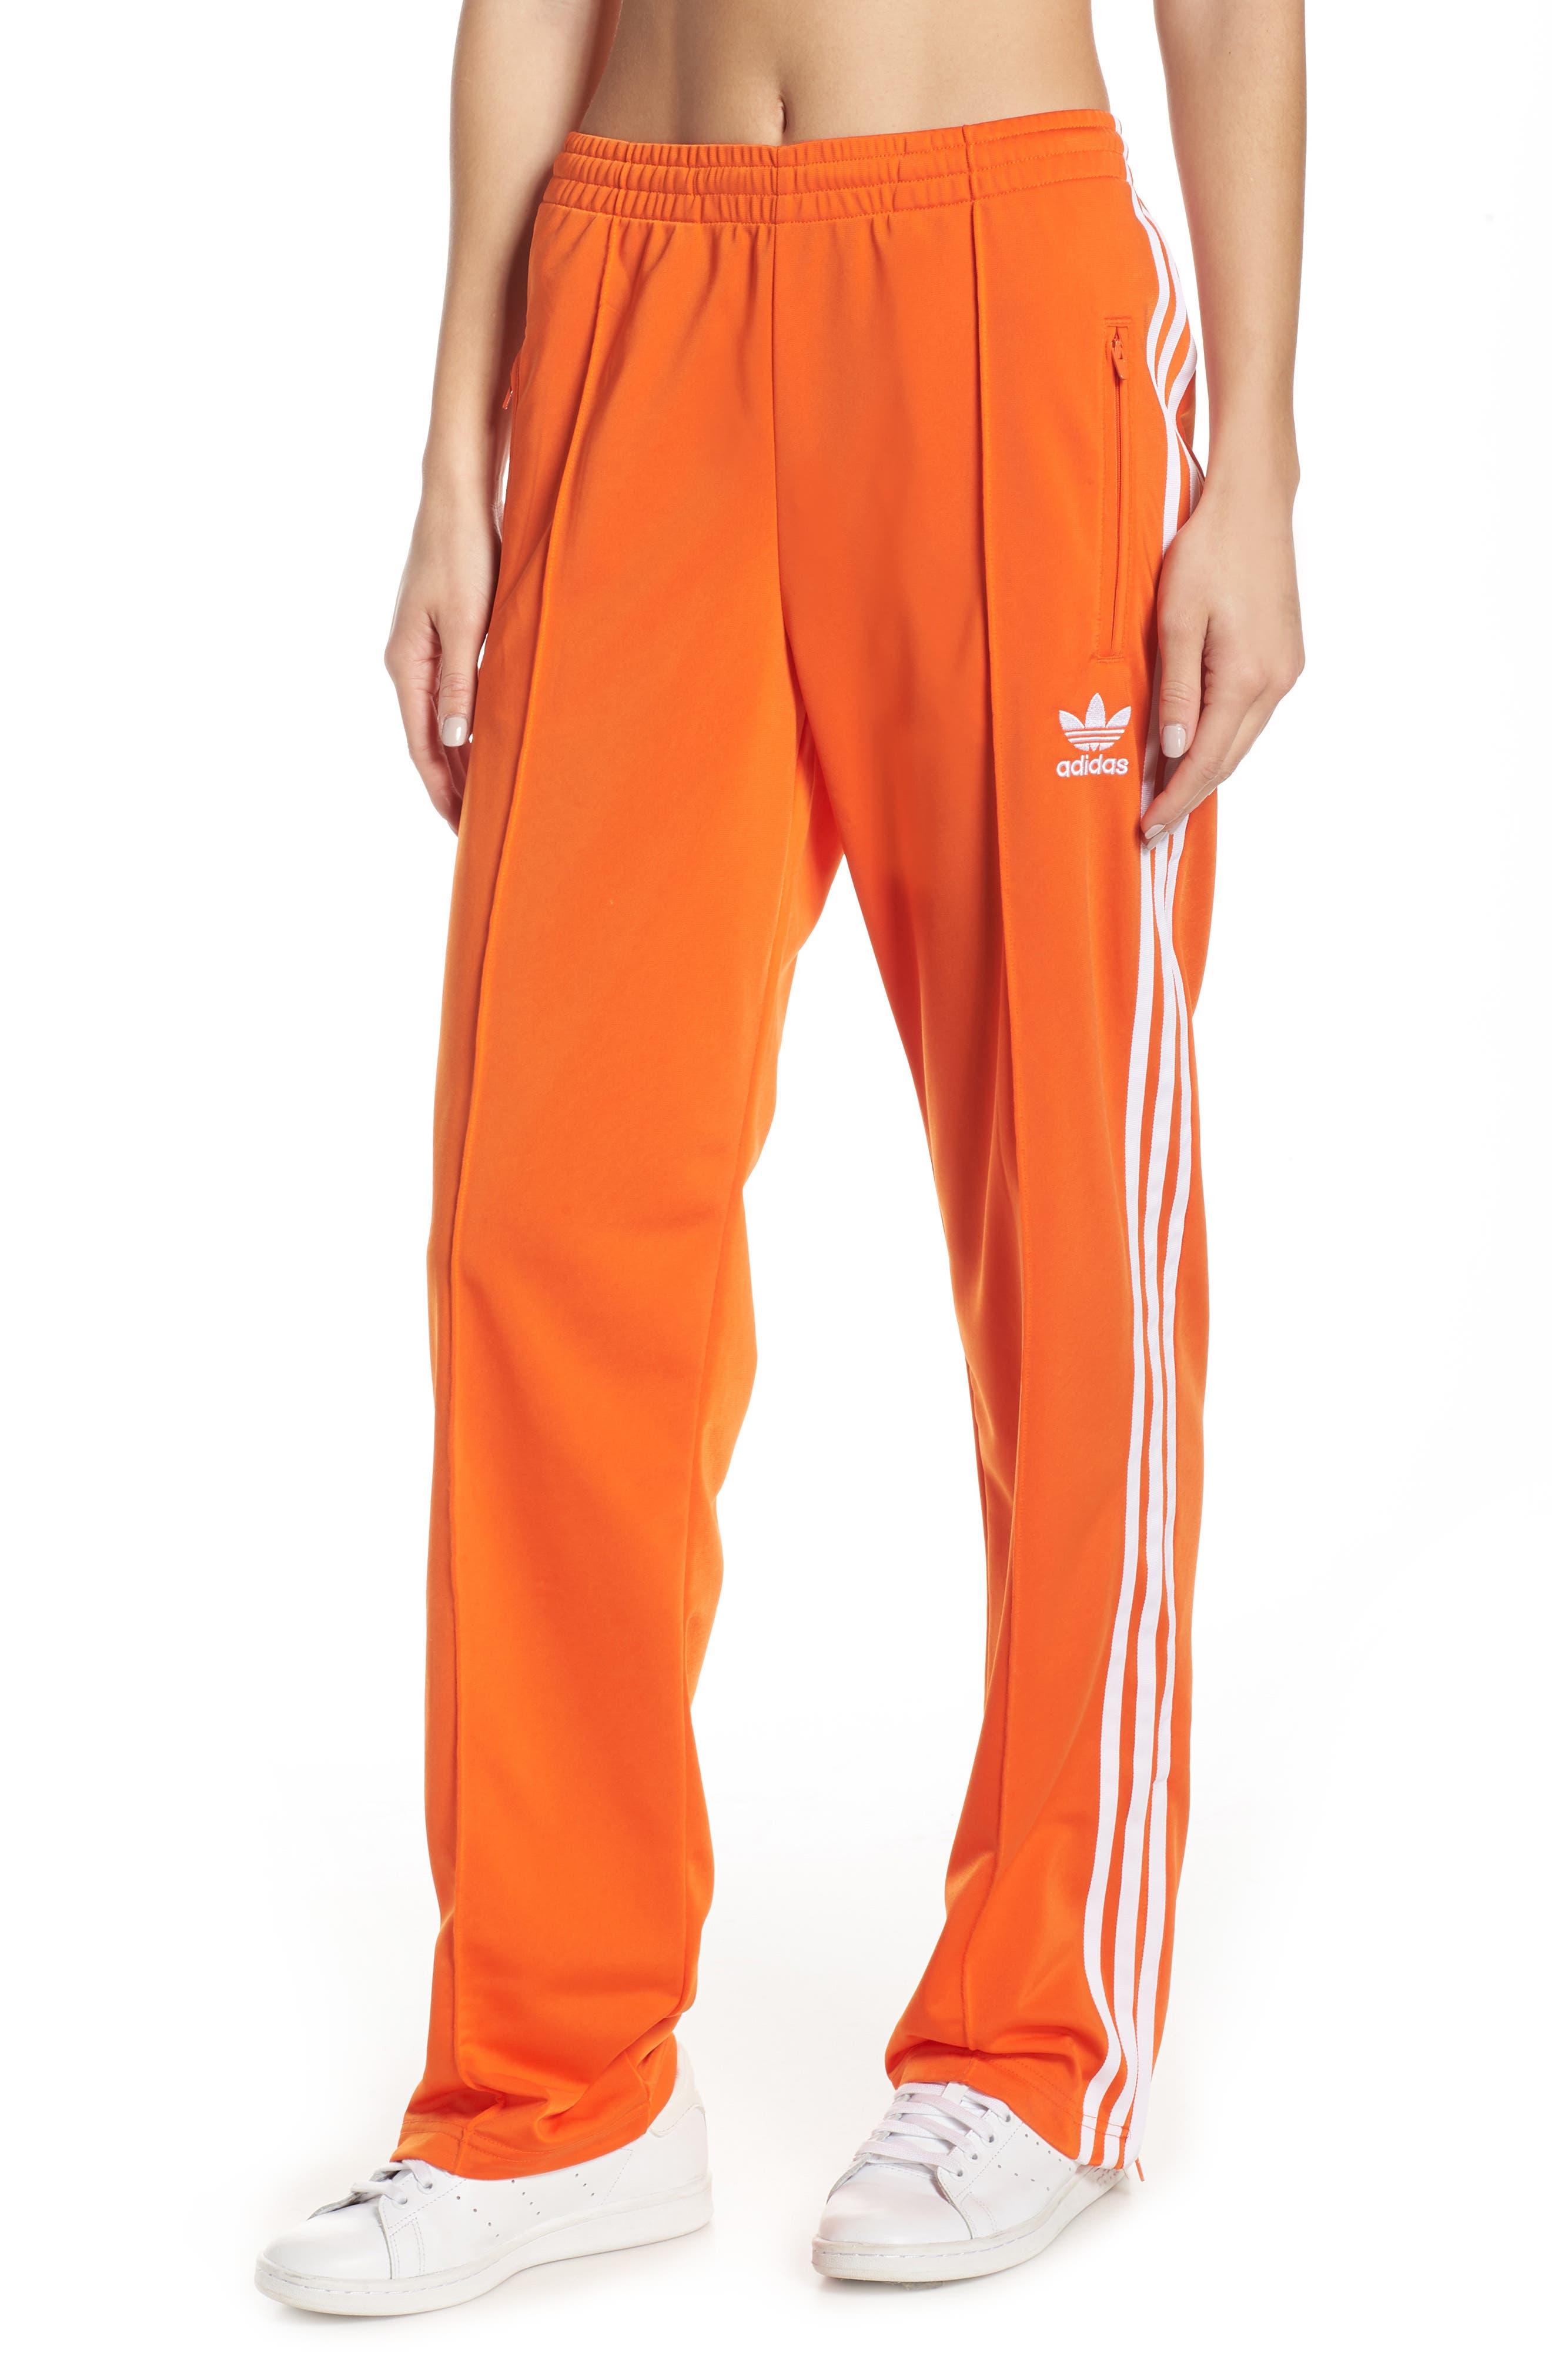 Women's Adidas Originals Pants & Leggings | Nordstrom